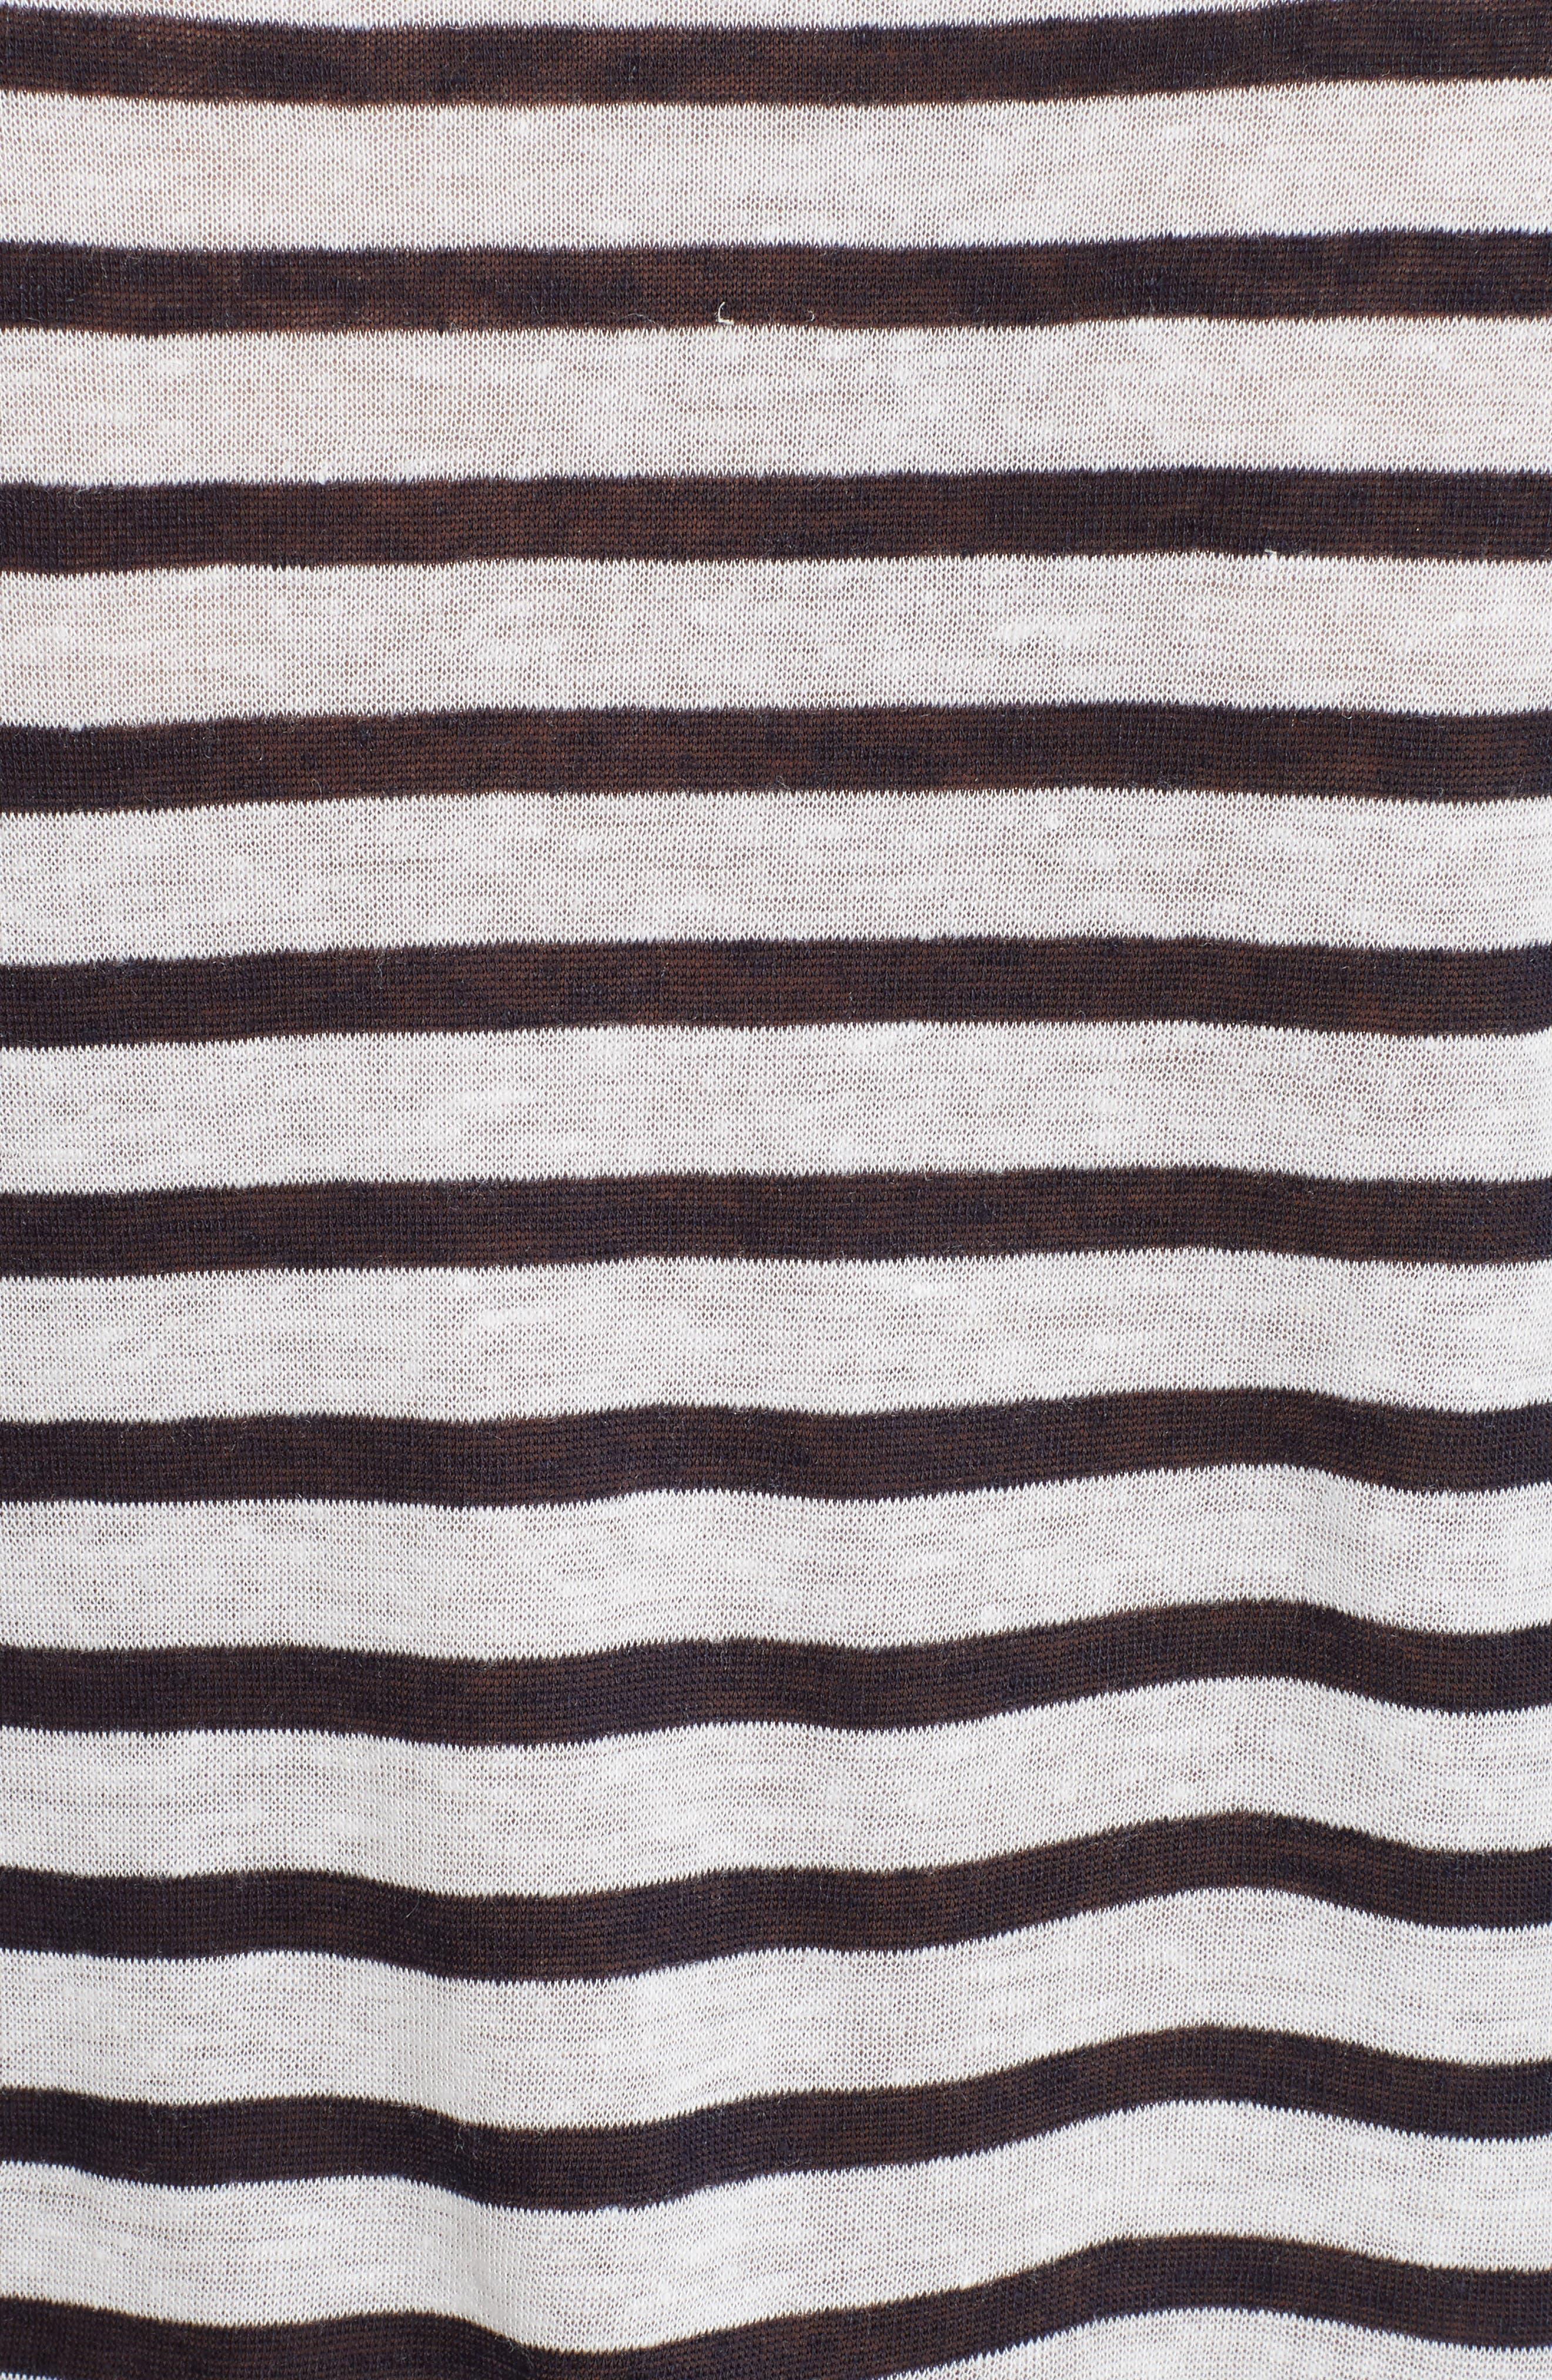 Stripe Tee,                             Alternate thumbnail 5, color,                             119